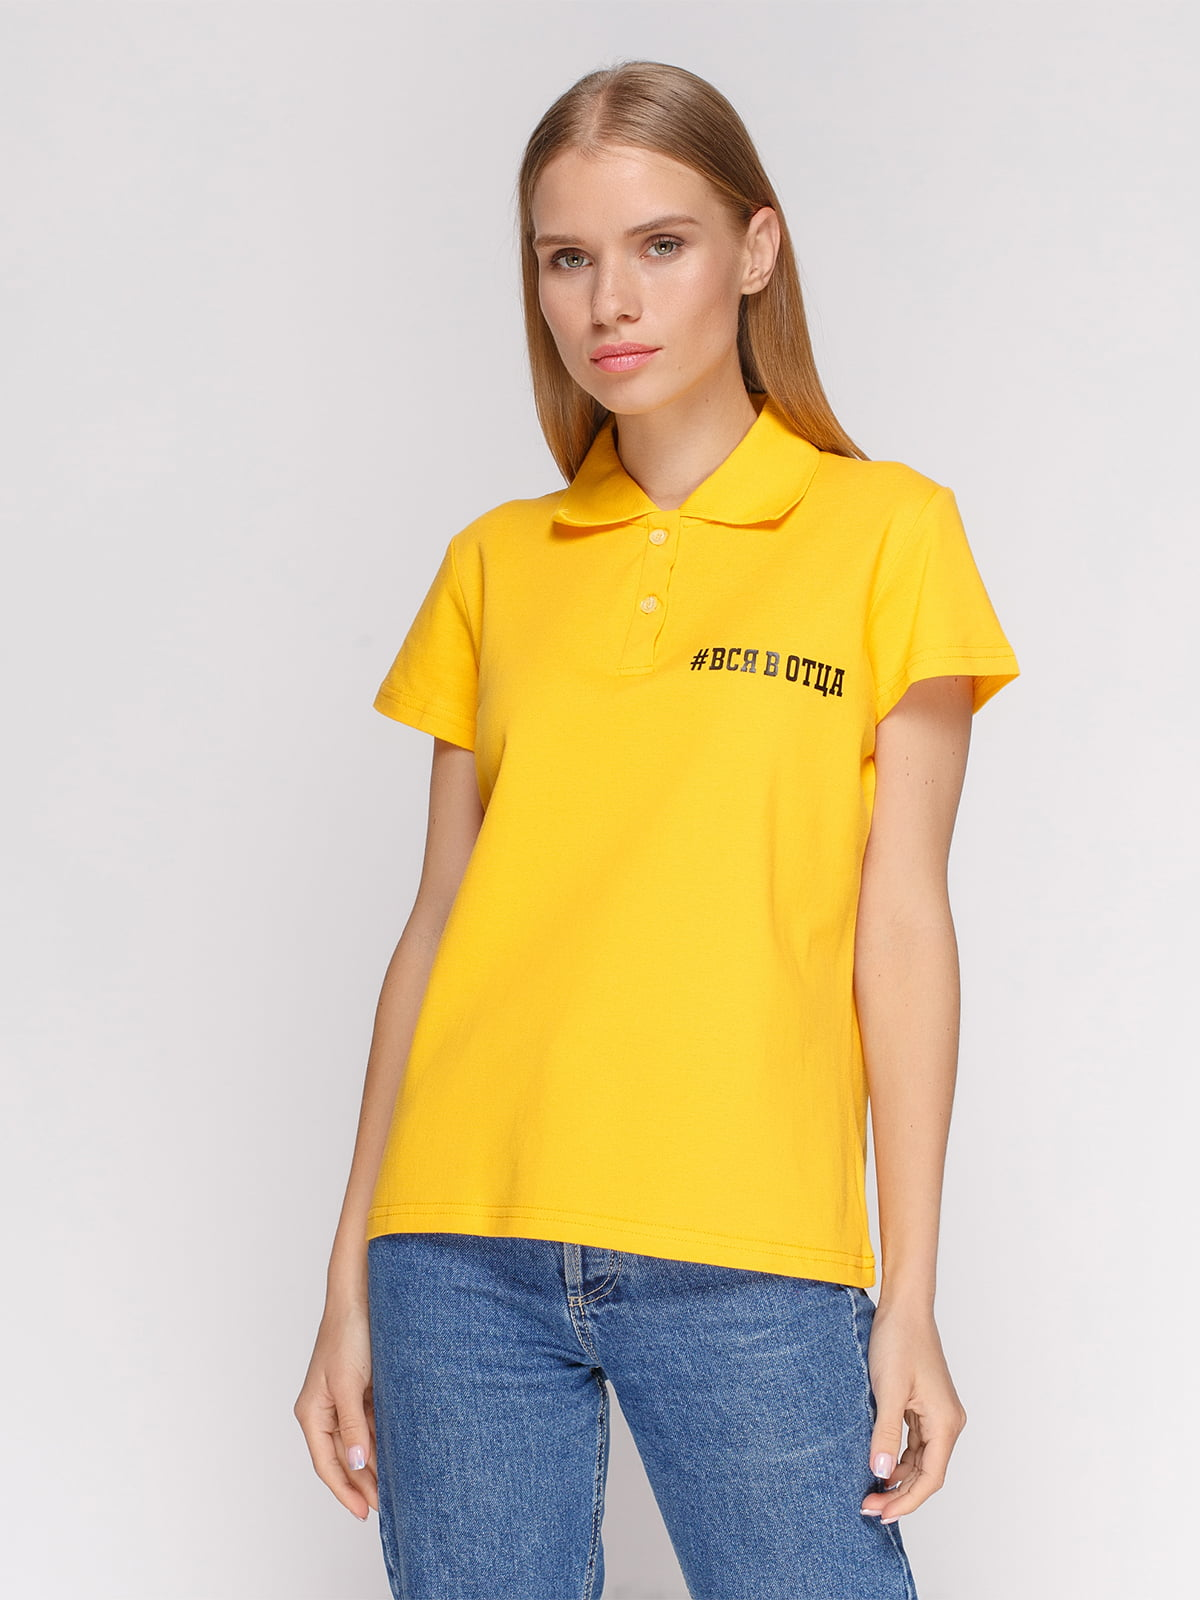 Футболка-поло жовта з принтом | 4578611